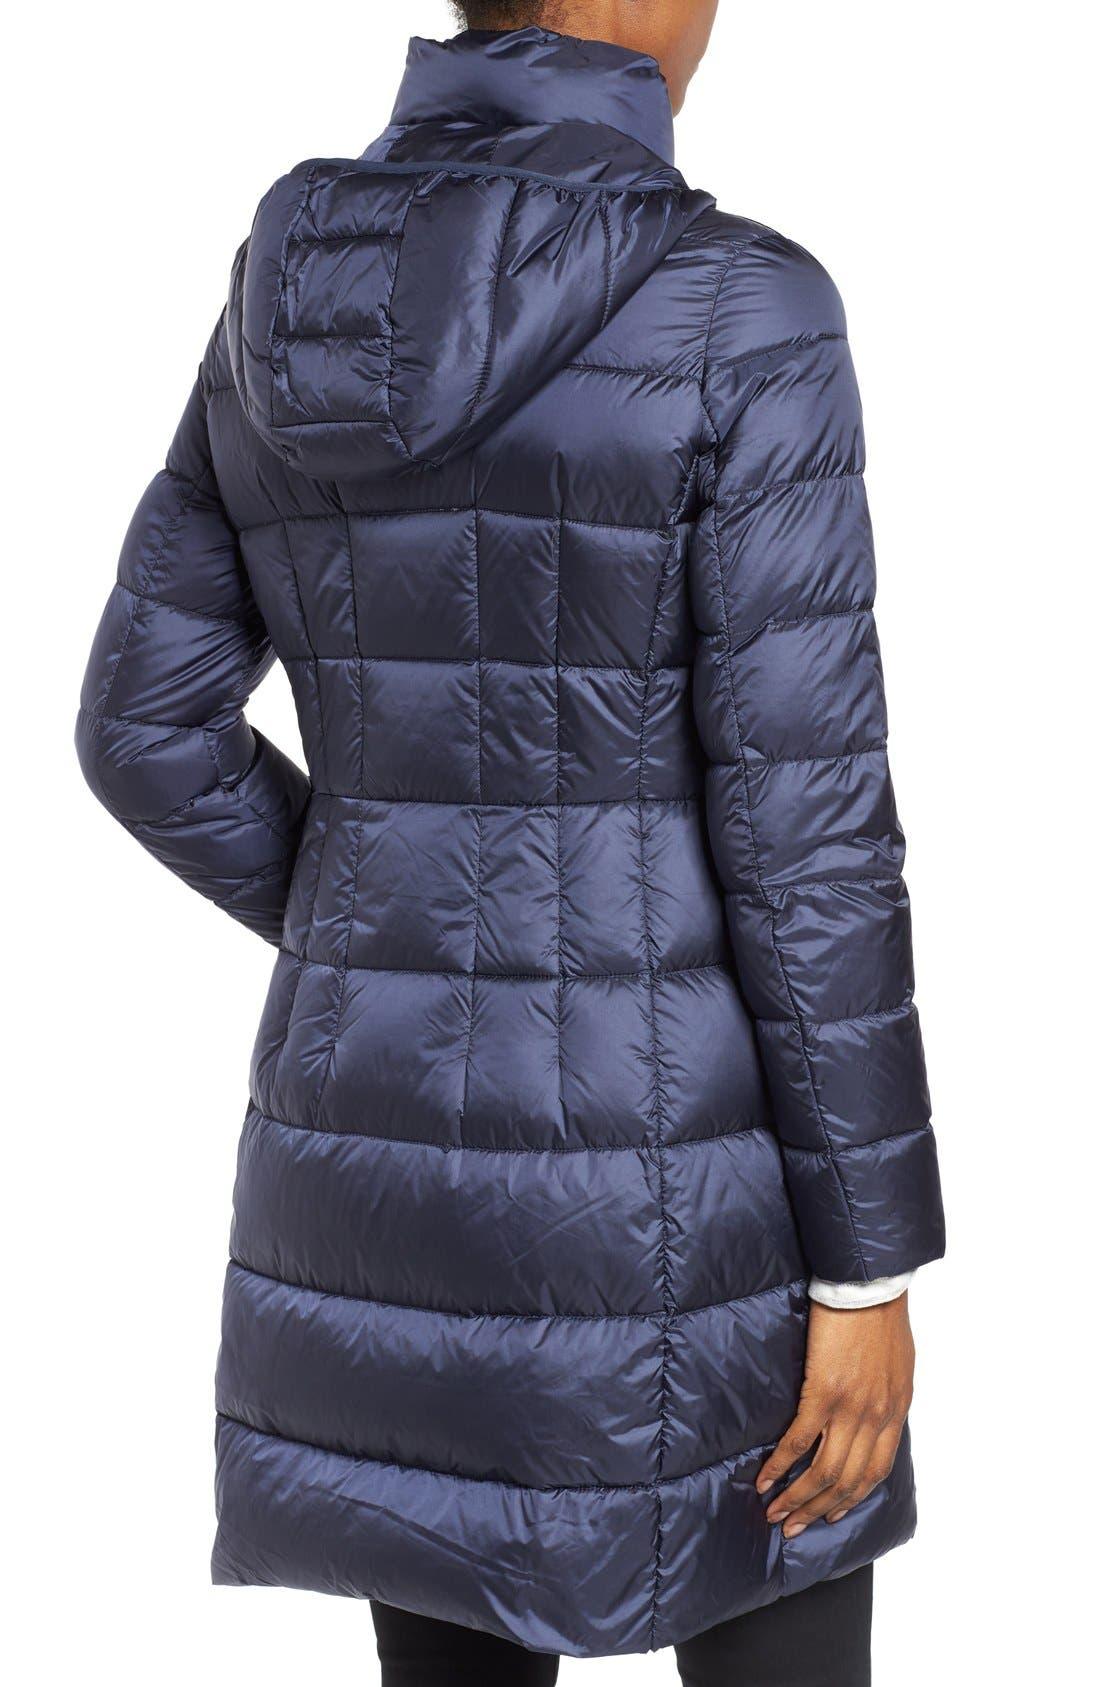 Packable Down Coat,                             Alternate thumbnail 2, color,                             Dark Blue